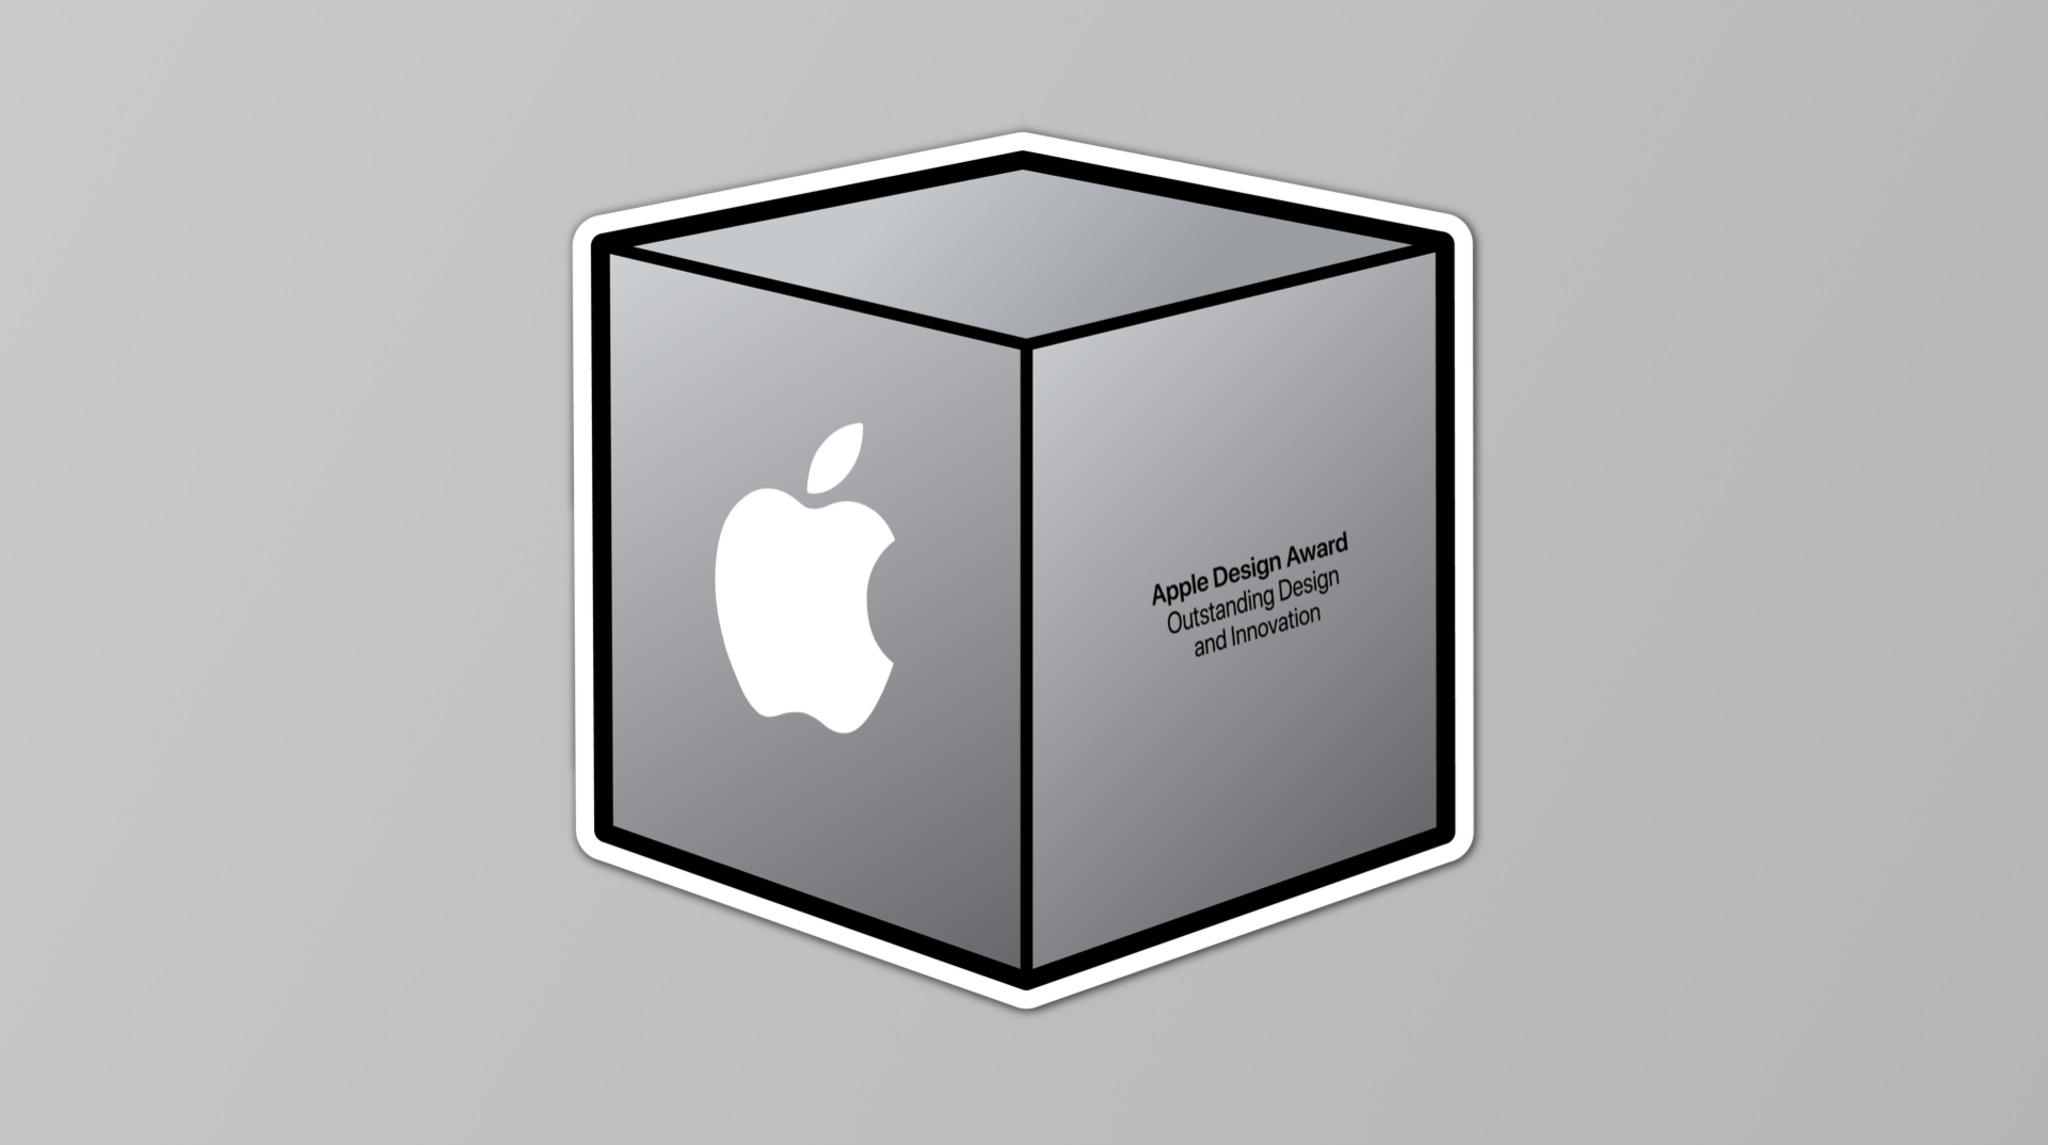 Apple Design Award sticker